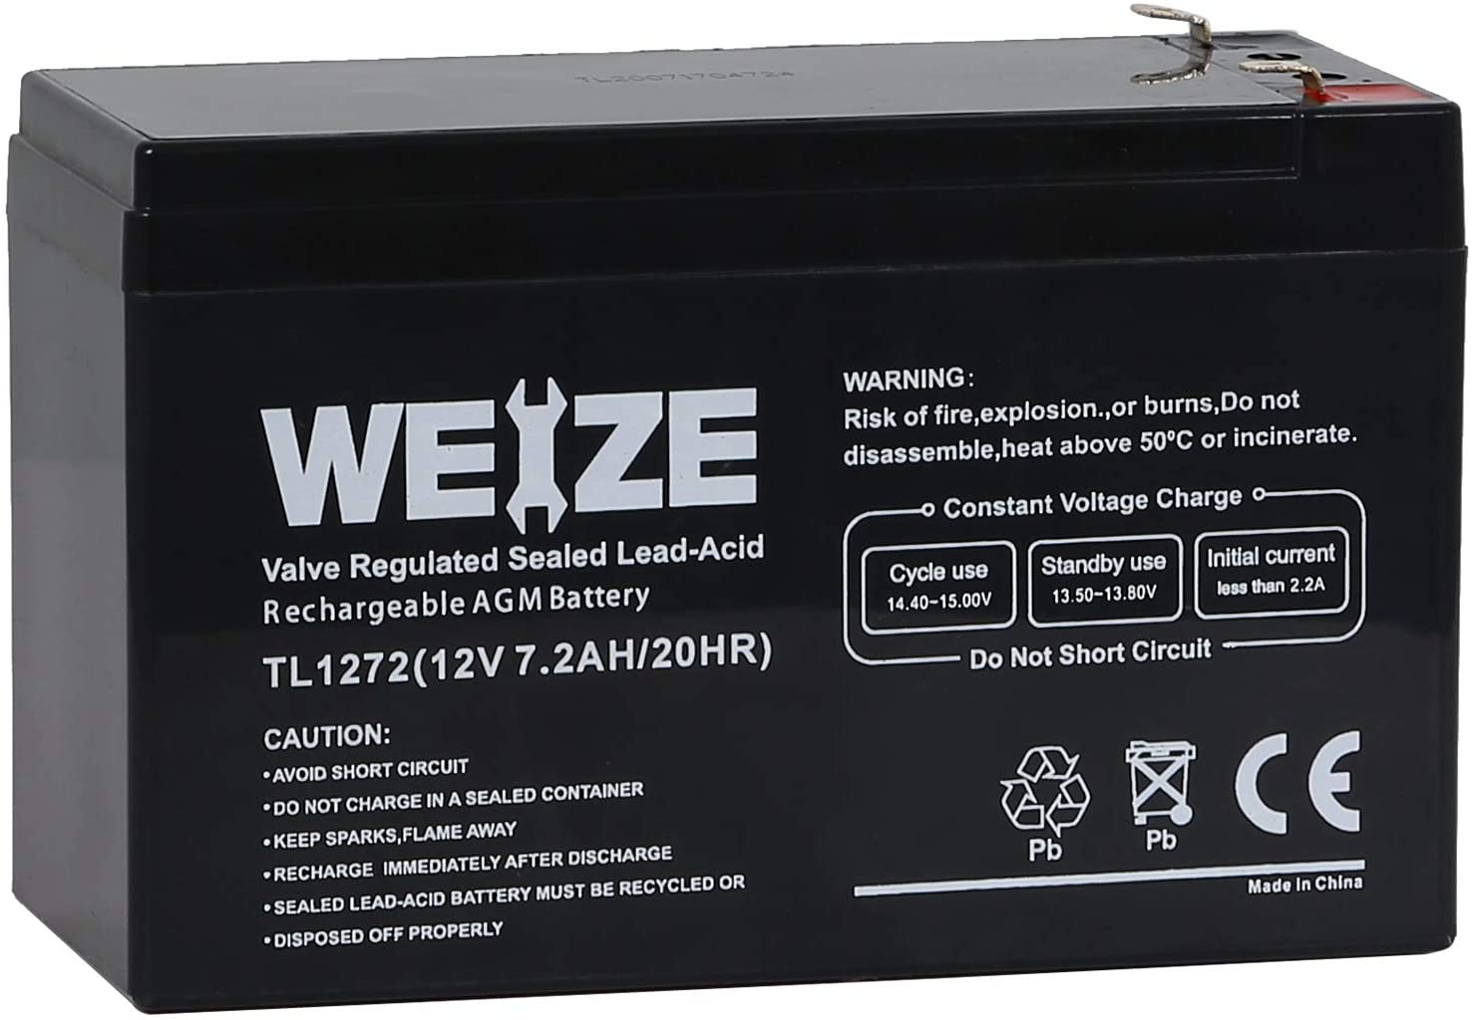 12V 7AH Battery Rechargeable 12 Volt 7 Amp Hour Sealed Lead Acid AGM Batteries for Razor E200/E200S E300 & E300S Electric Scooter,MX350 & MX400 Dirt Rocket Electric Dirt Bike Parts